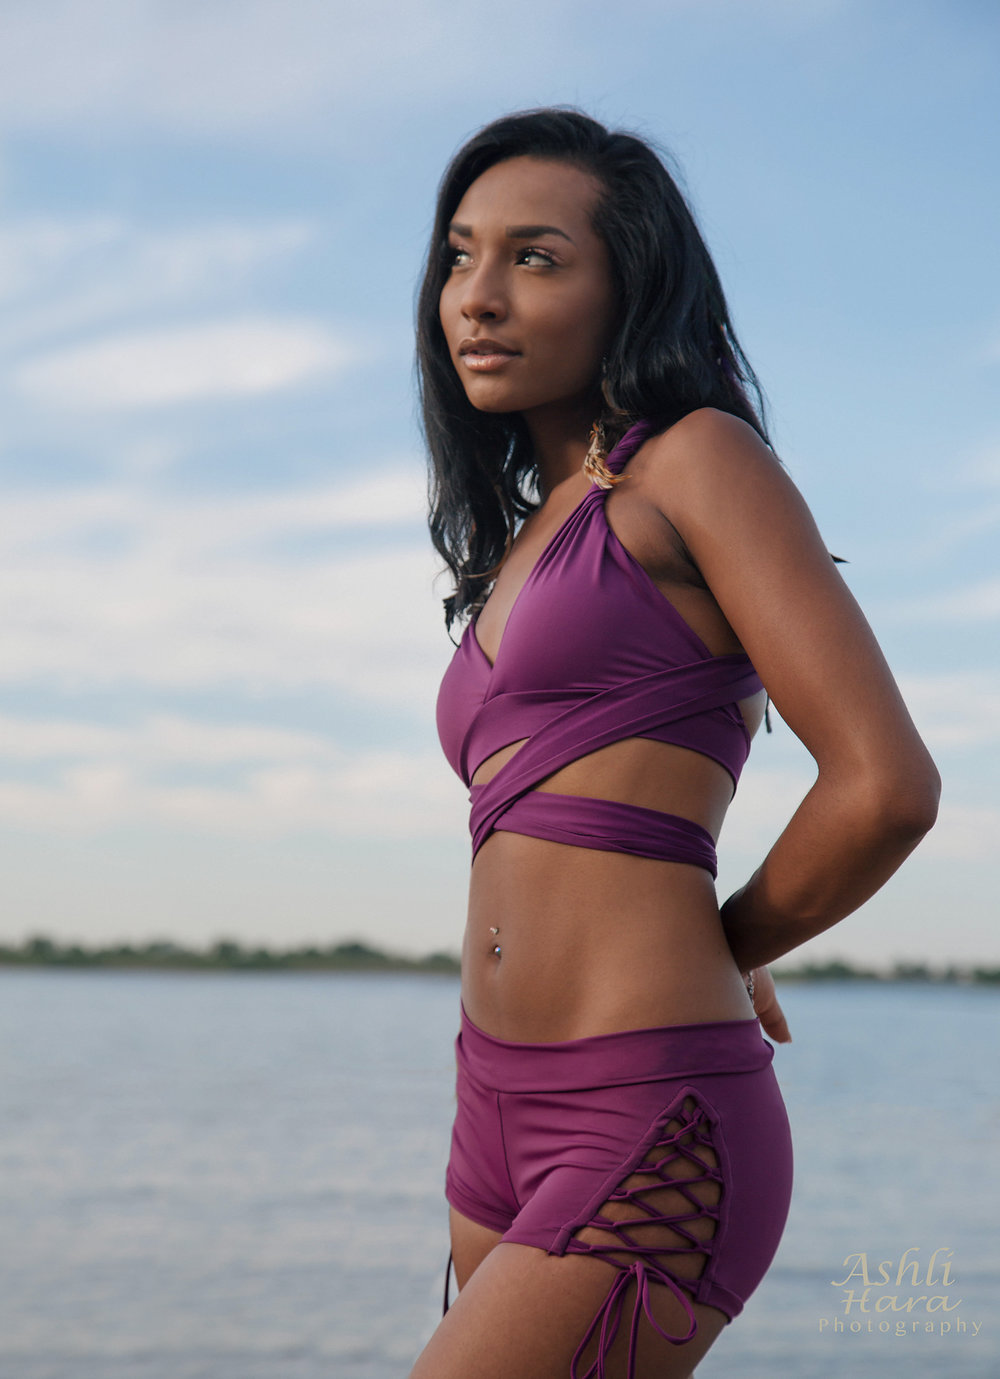 Ashlihara Photography ~ TY swimsuit 2.jpg